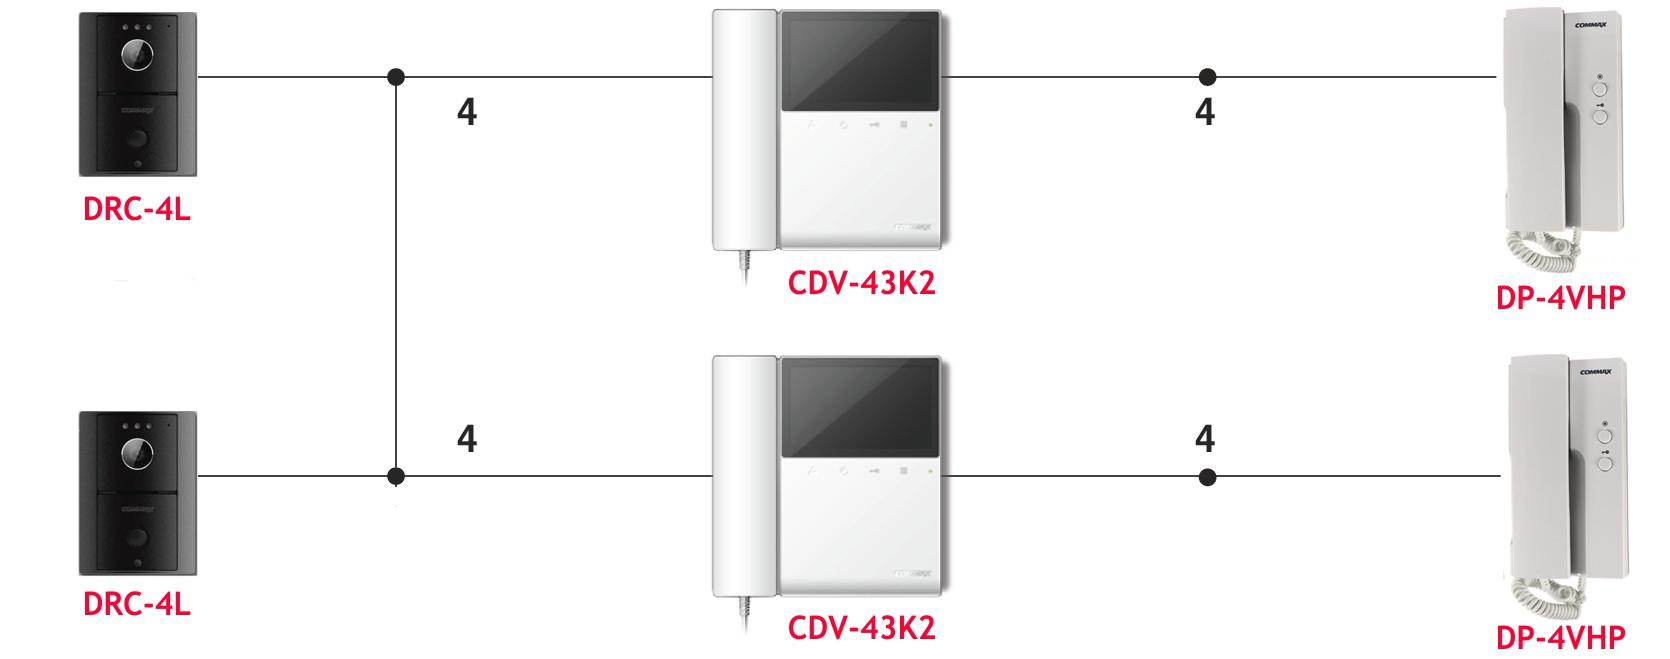 Commax Intercom Wiring Diagram 30 Images Atlas Diagrams Cdv43k2 Drc4l And Schematic Design